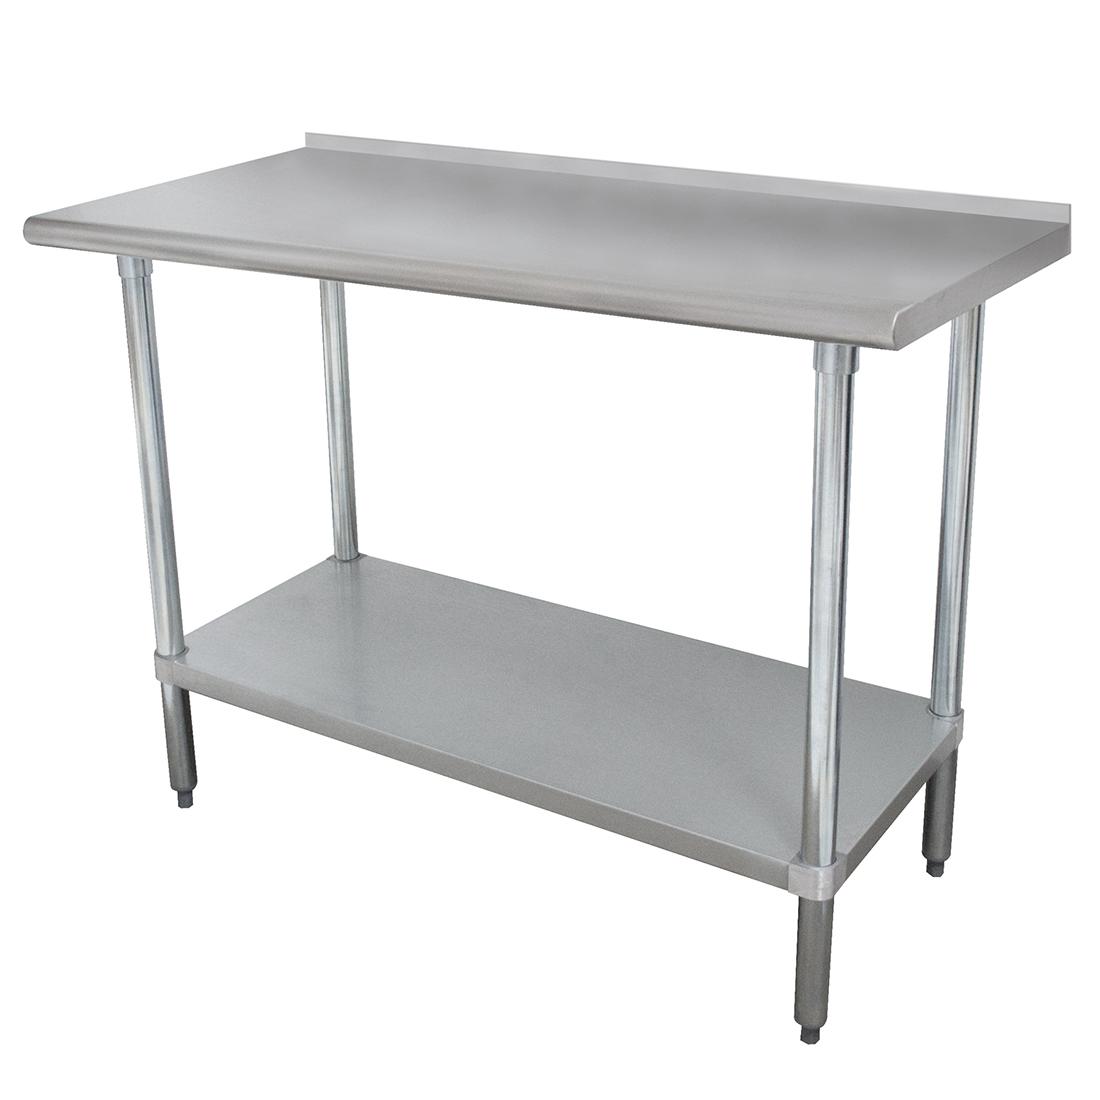 Advance Tabco FLG-363 work table,  36